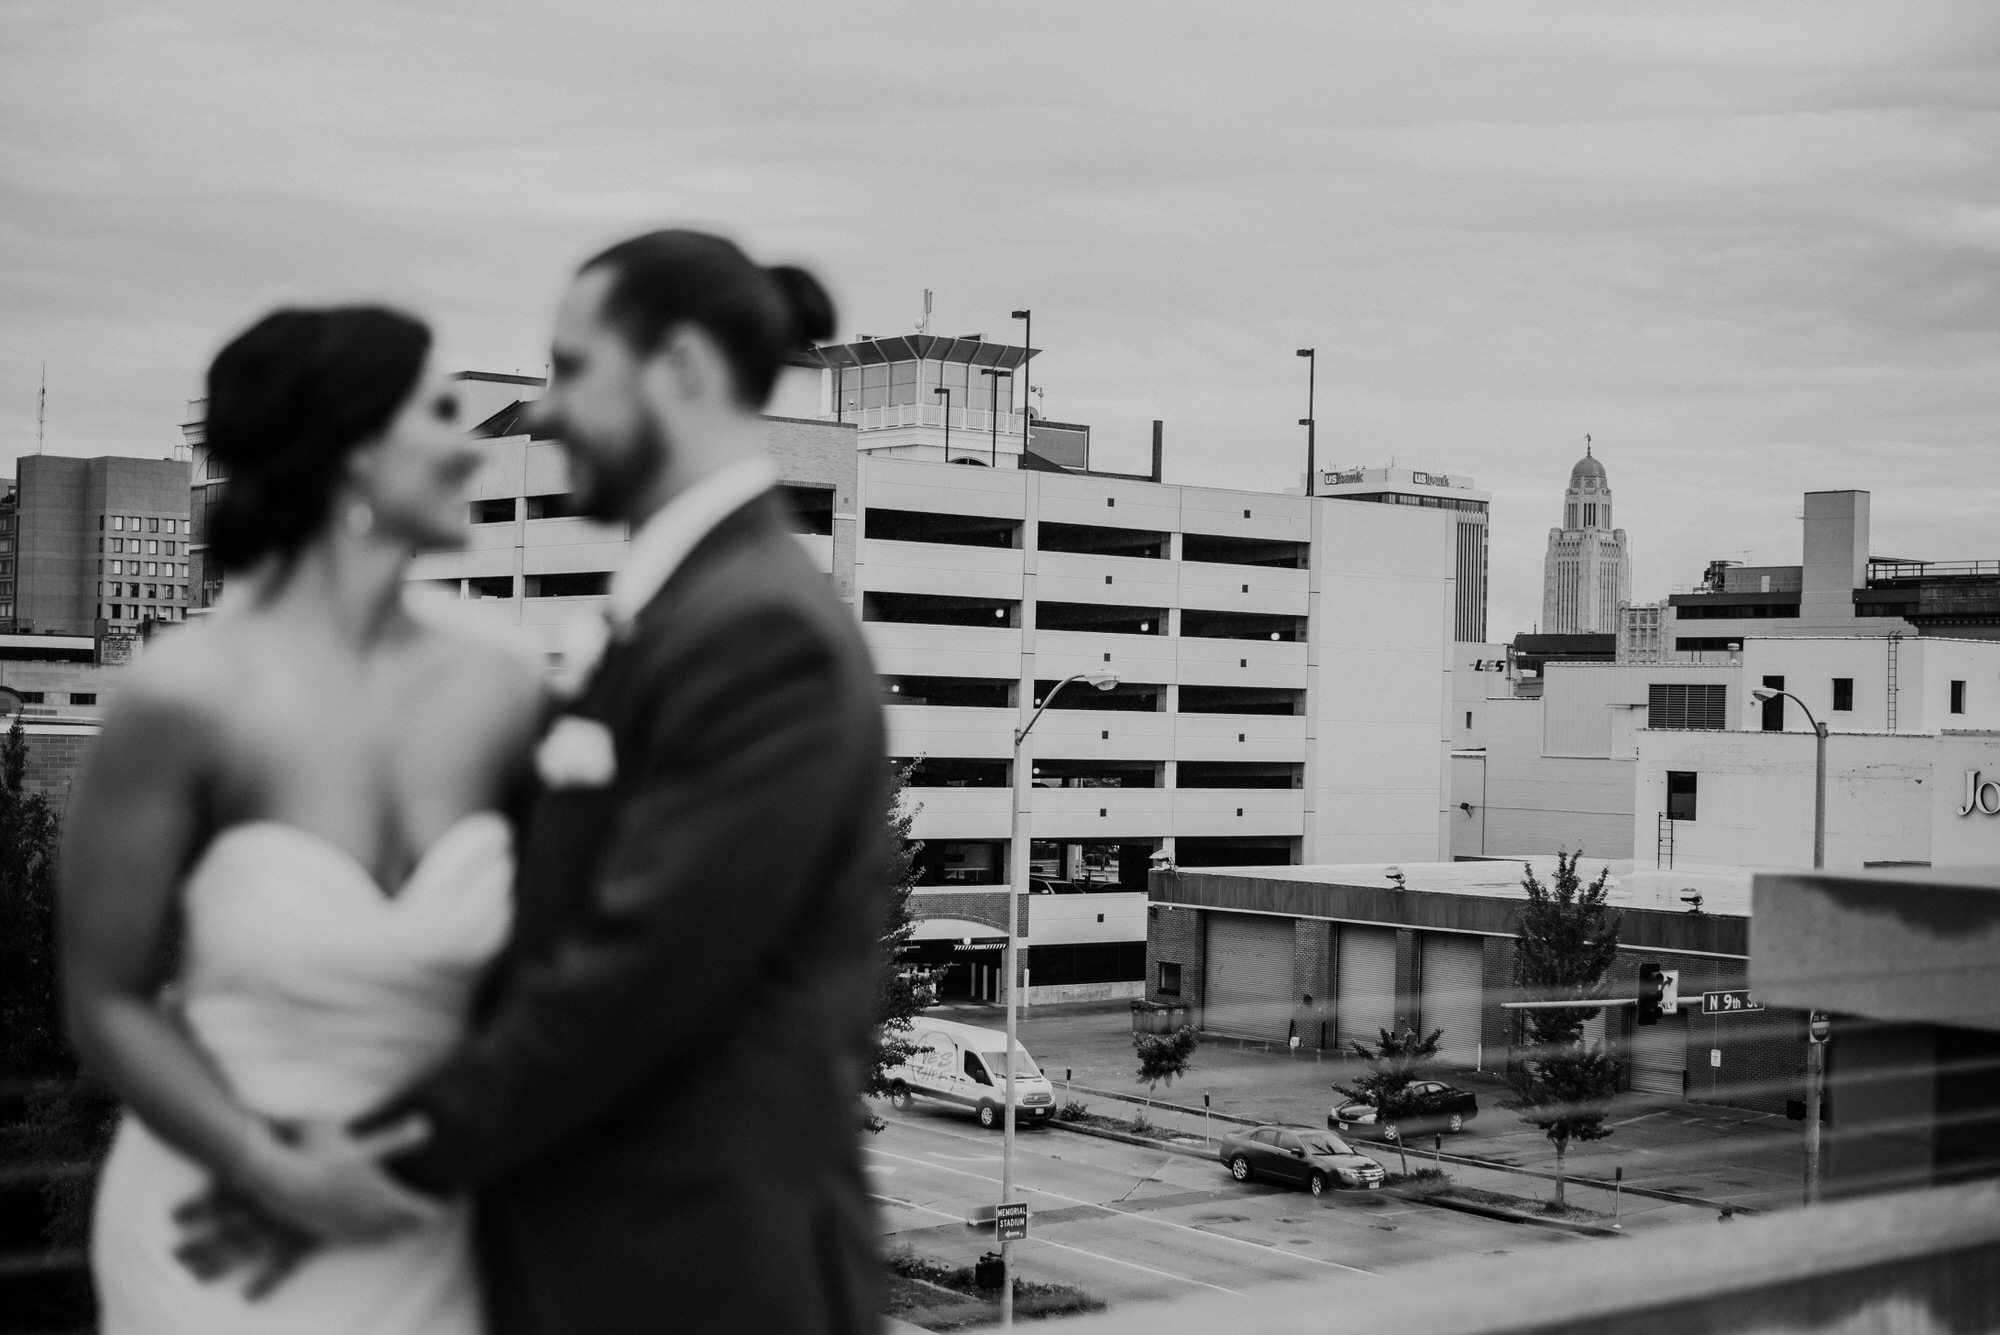 Kaylie_Sirek_Photography_Grand_Island_Kearney_Hastings_Lincoln_Nebraska_Wedding_Engagement_Grandma_Grandparent_Delray_Downtown_DowntownLincoln_LNK_Emotional_Bride_Groom_Photographer_31.jpg